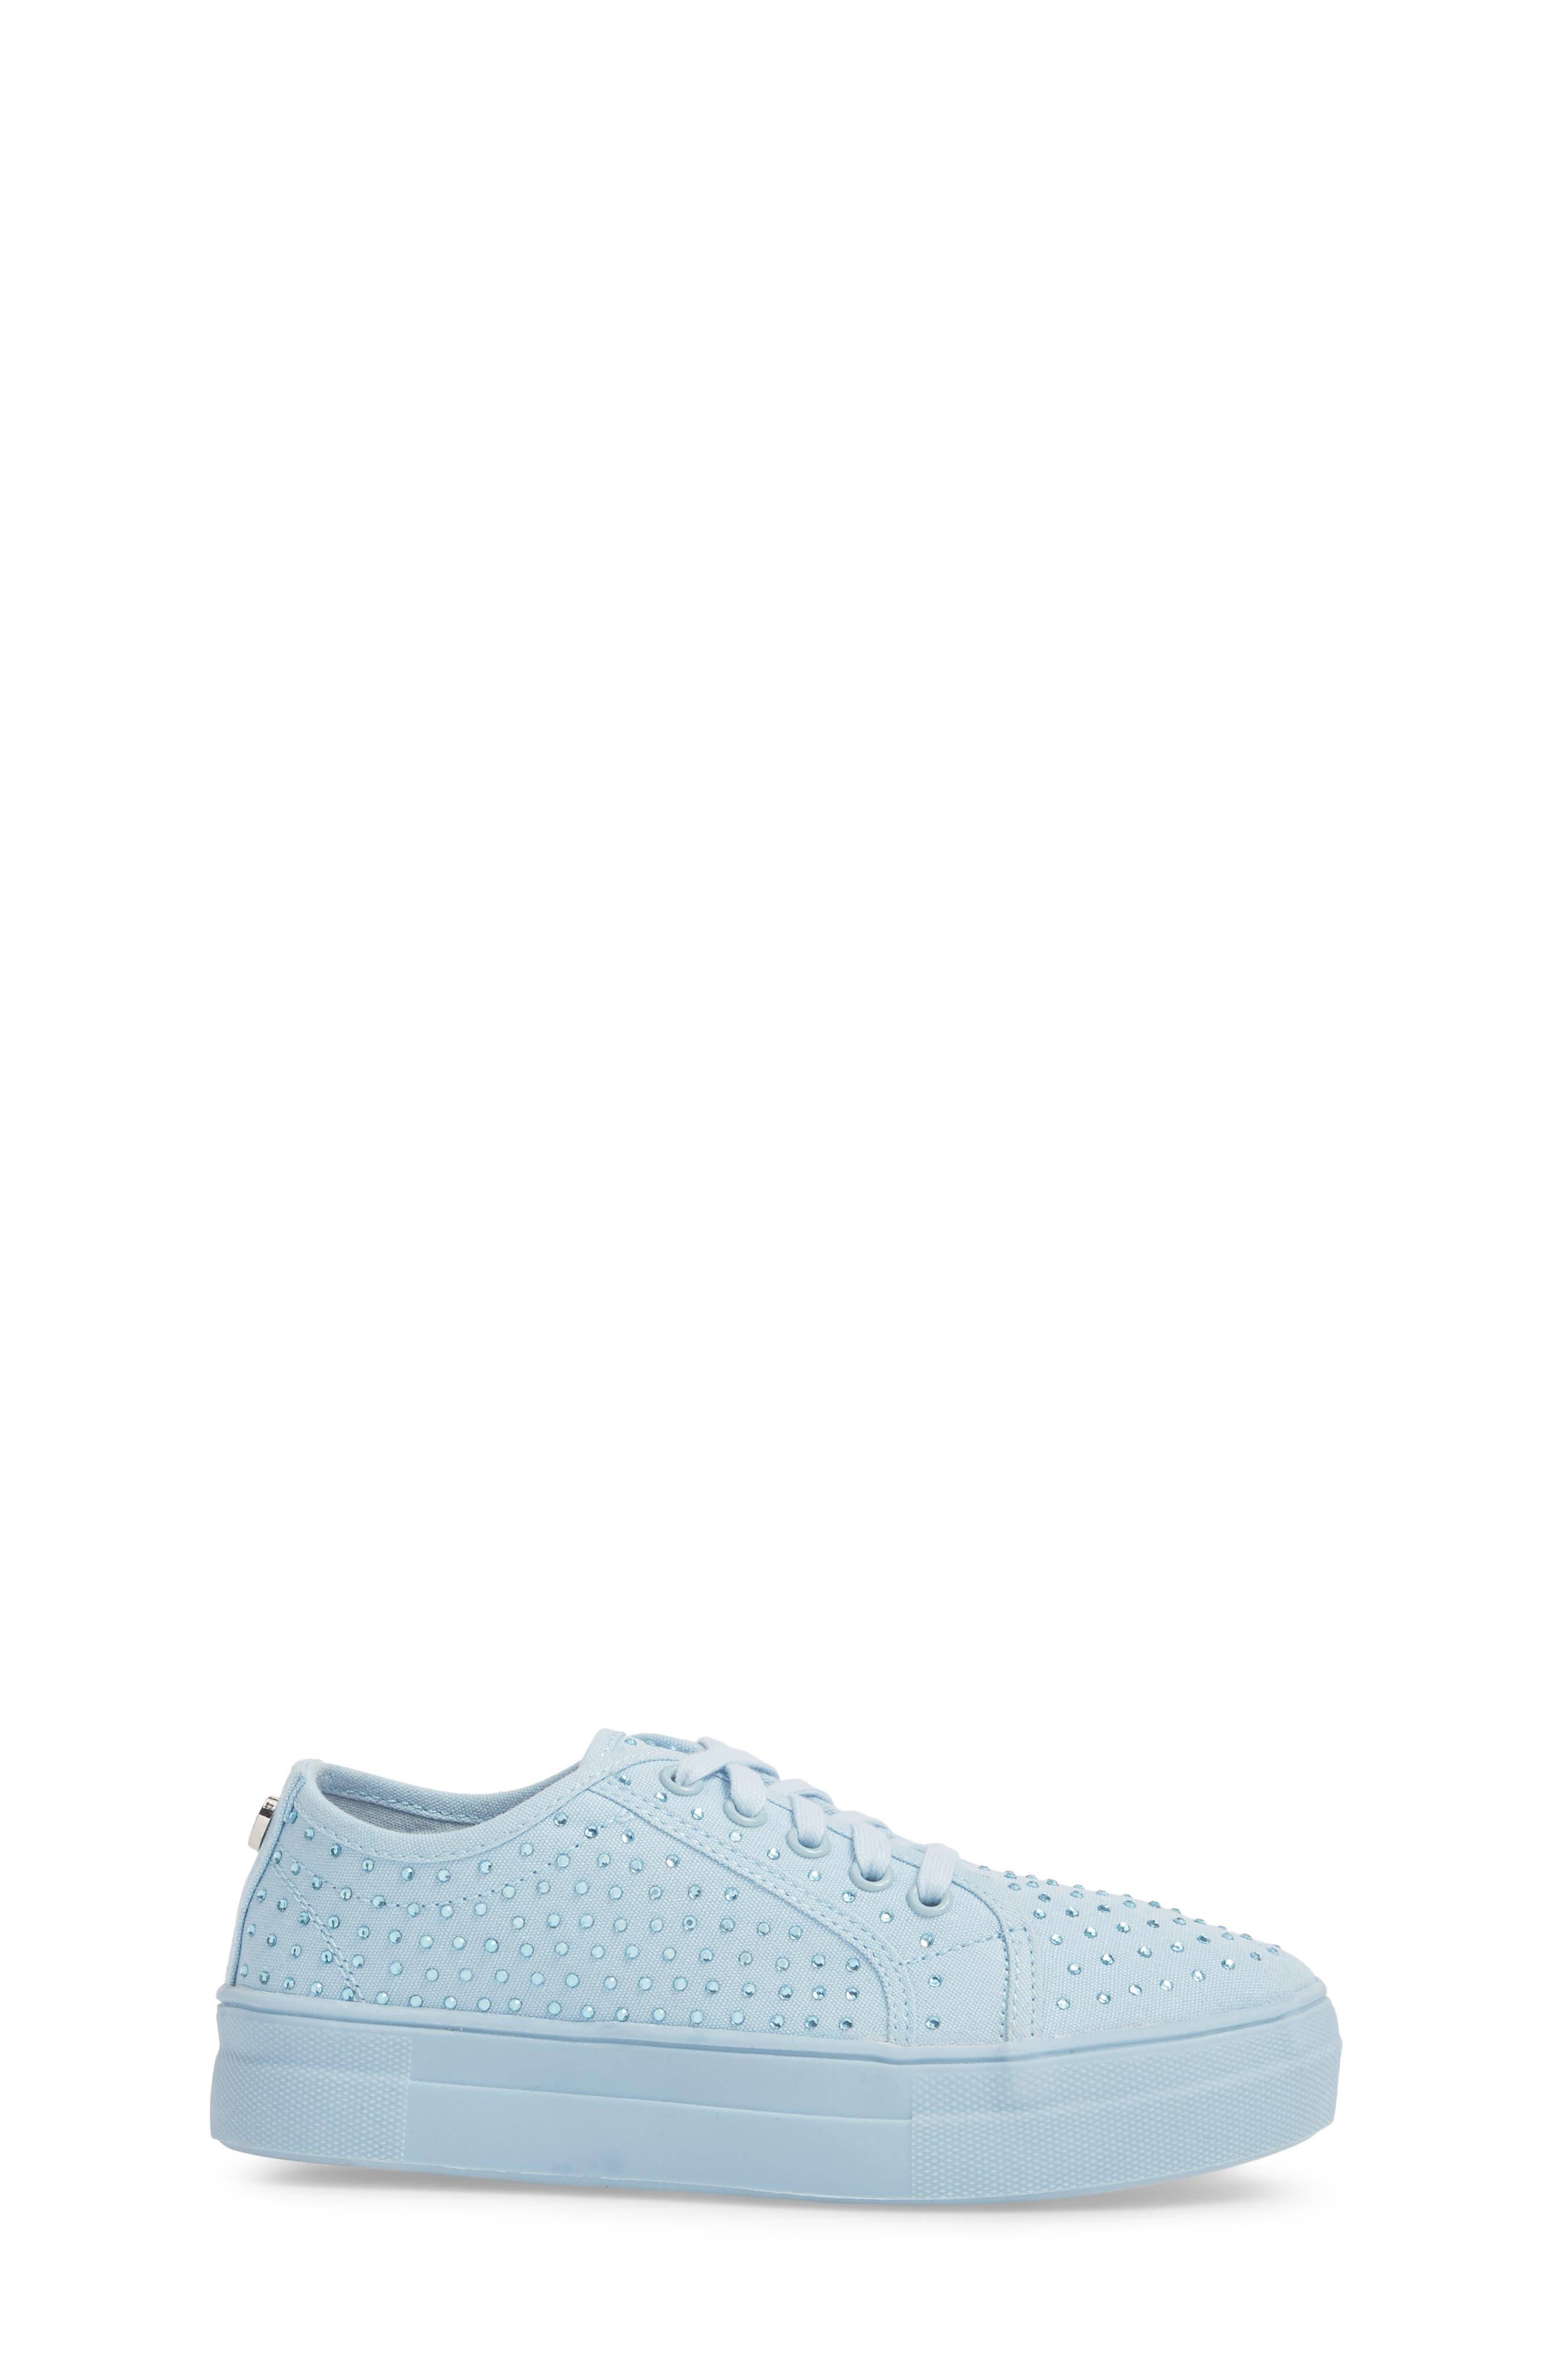 Jmono Sneaker,                             Alternate thumbnail 3, color,                             Blue